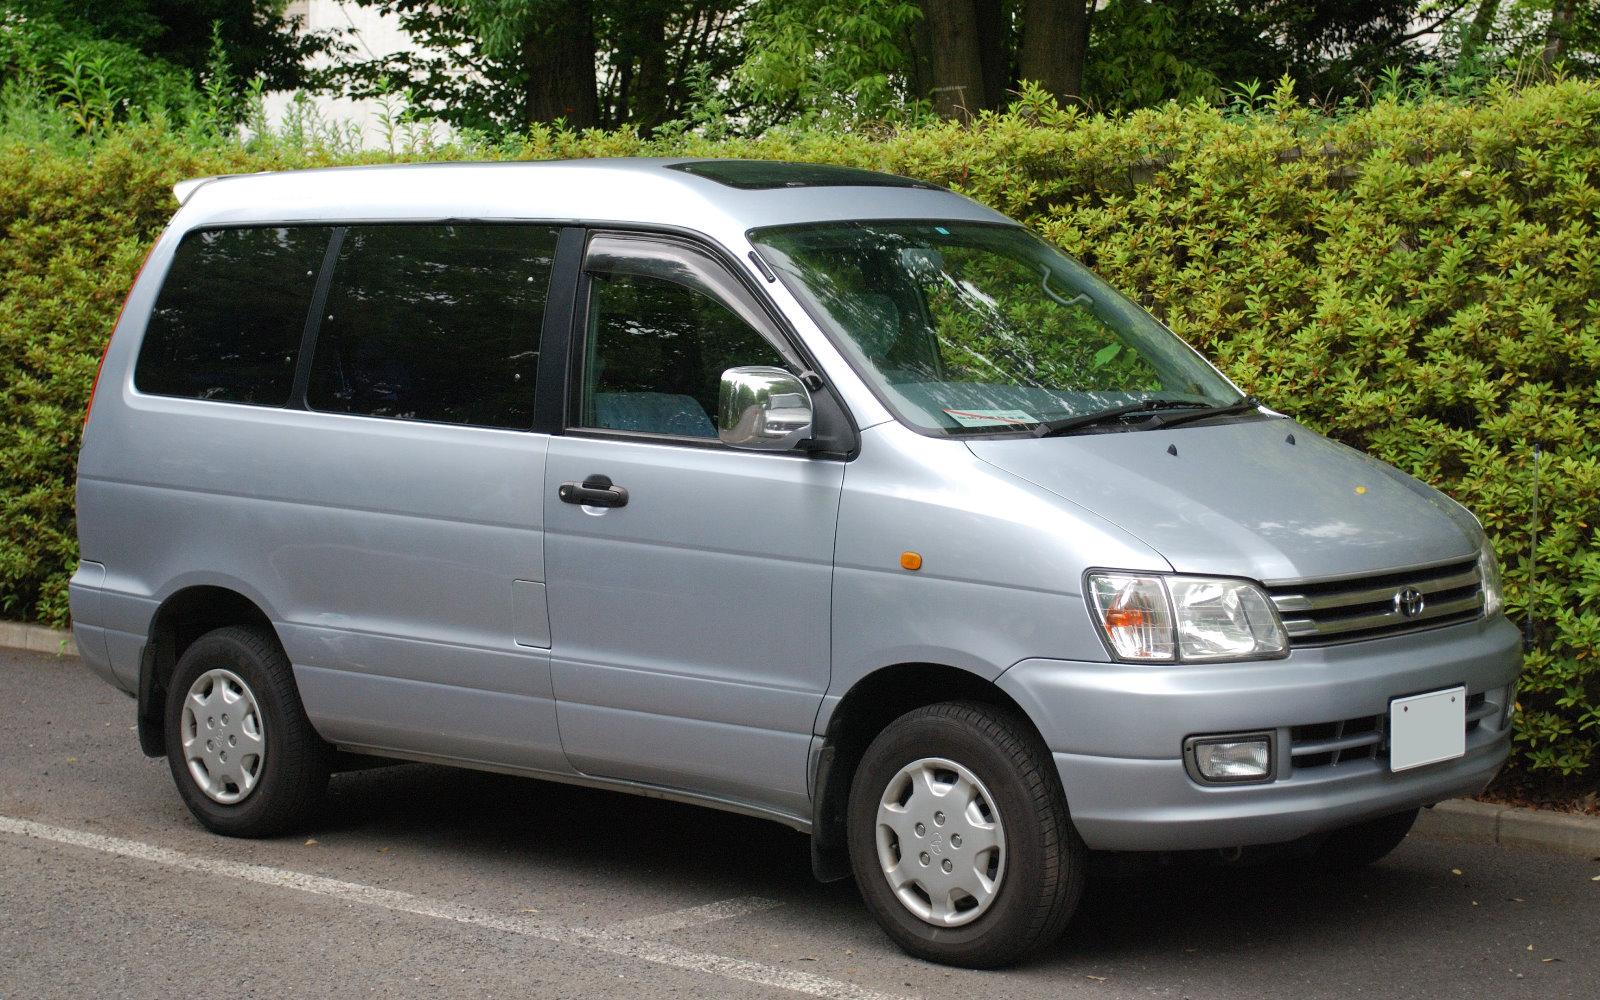 Daihatsu Delta Wagon III 1996 - 2001 Compact MPV #5